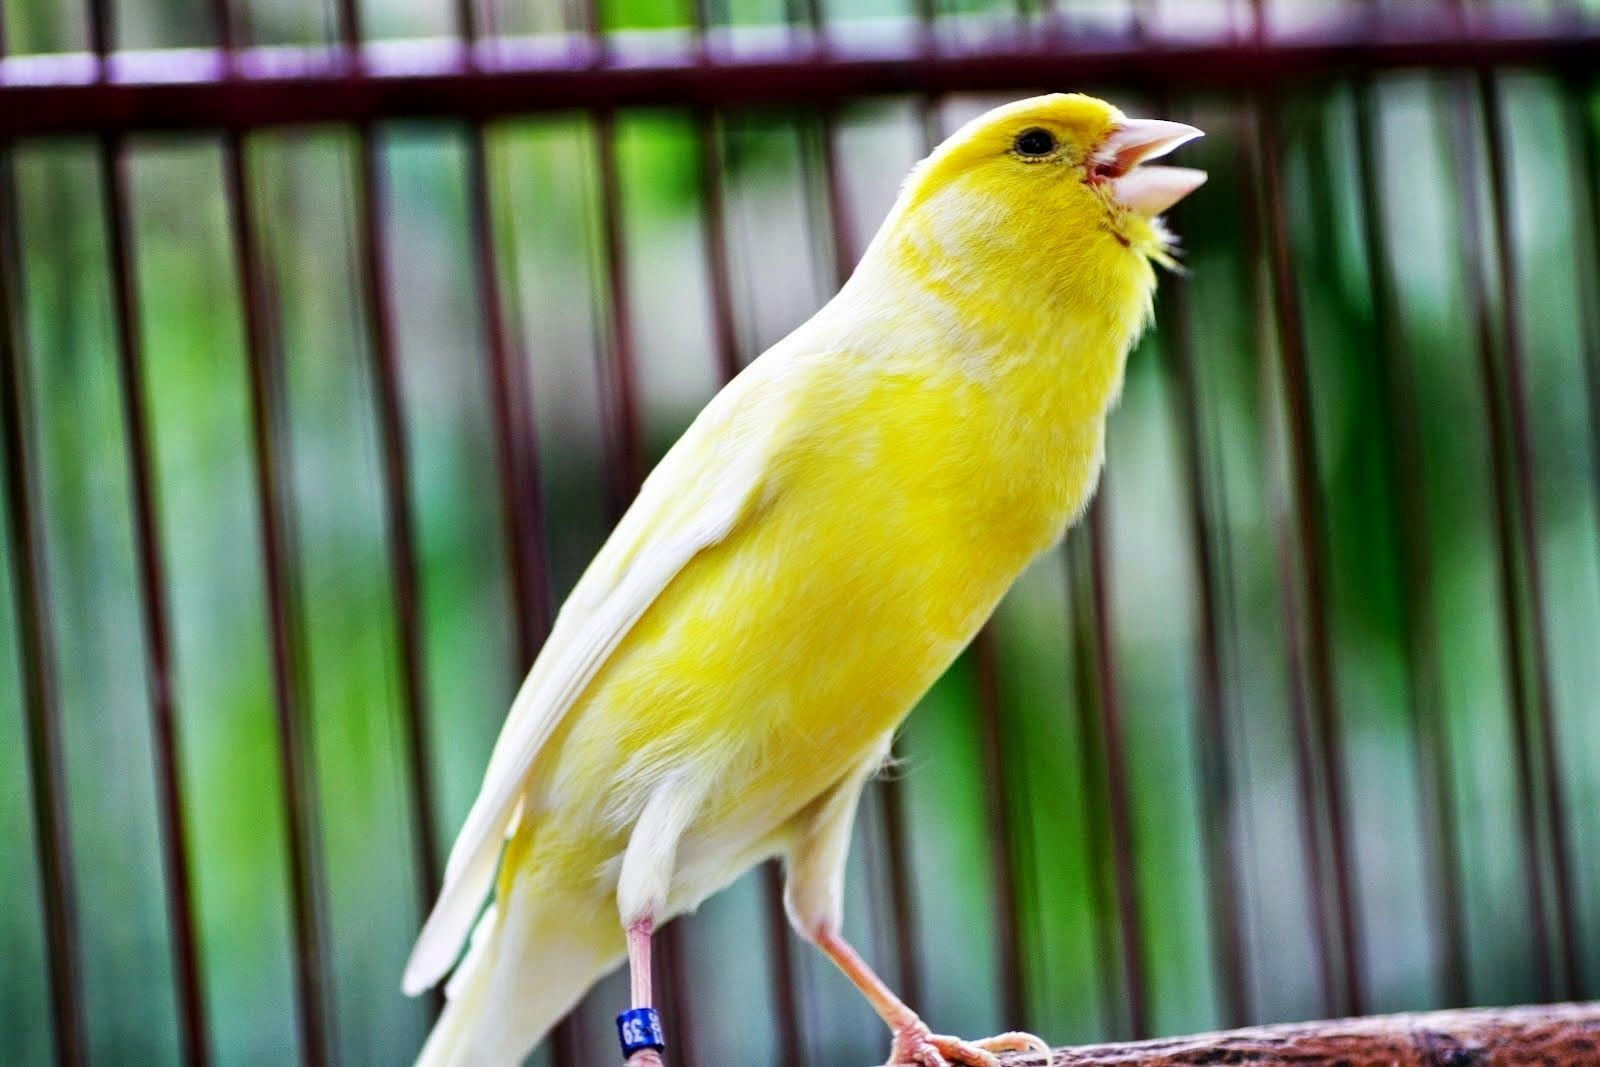 Burung Kenari Burung Burung Suara Binatang Lucu